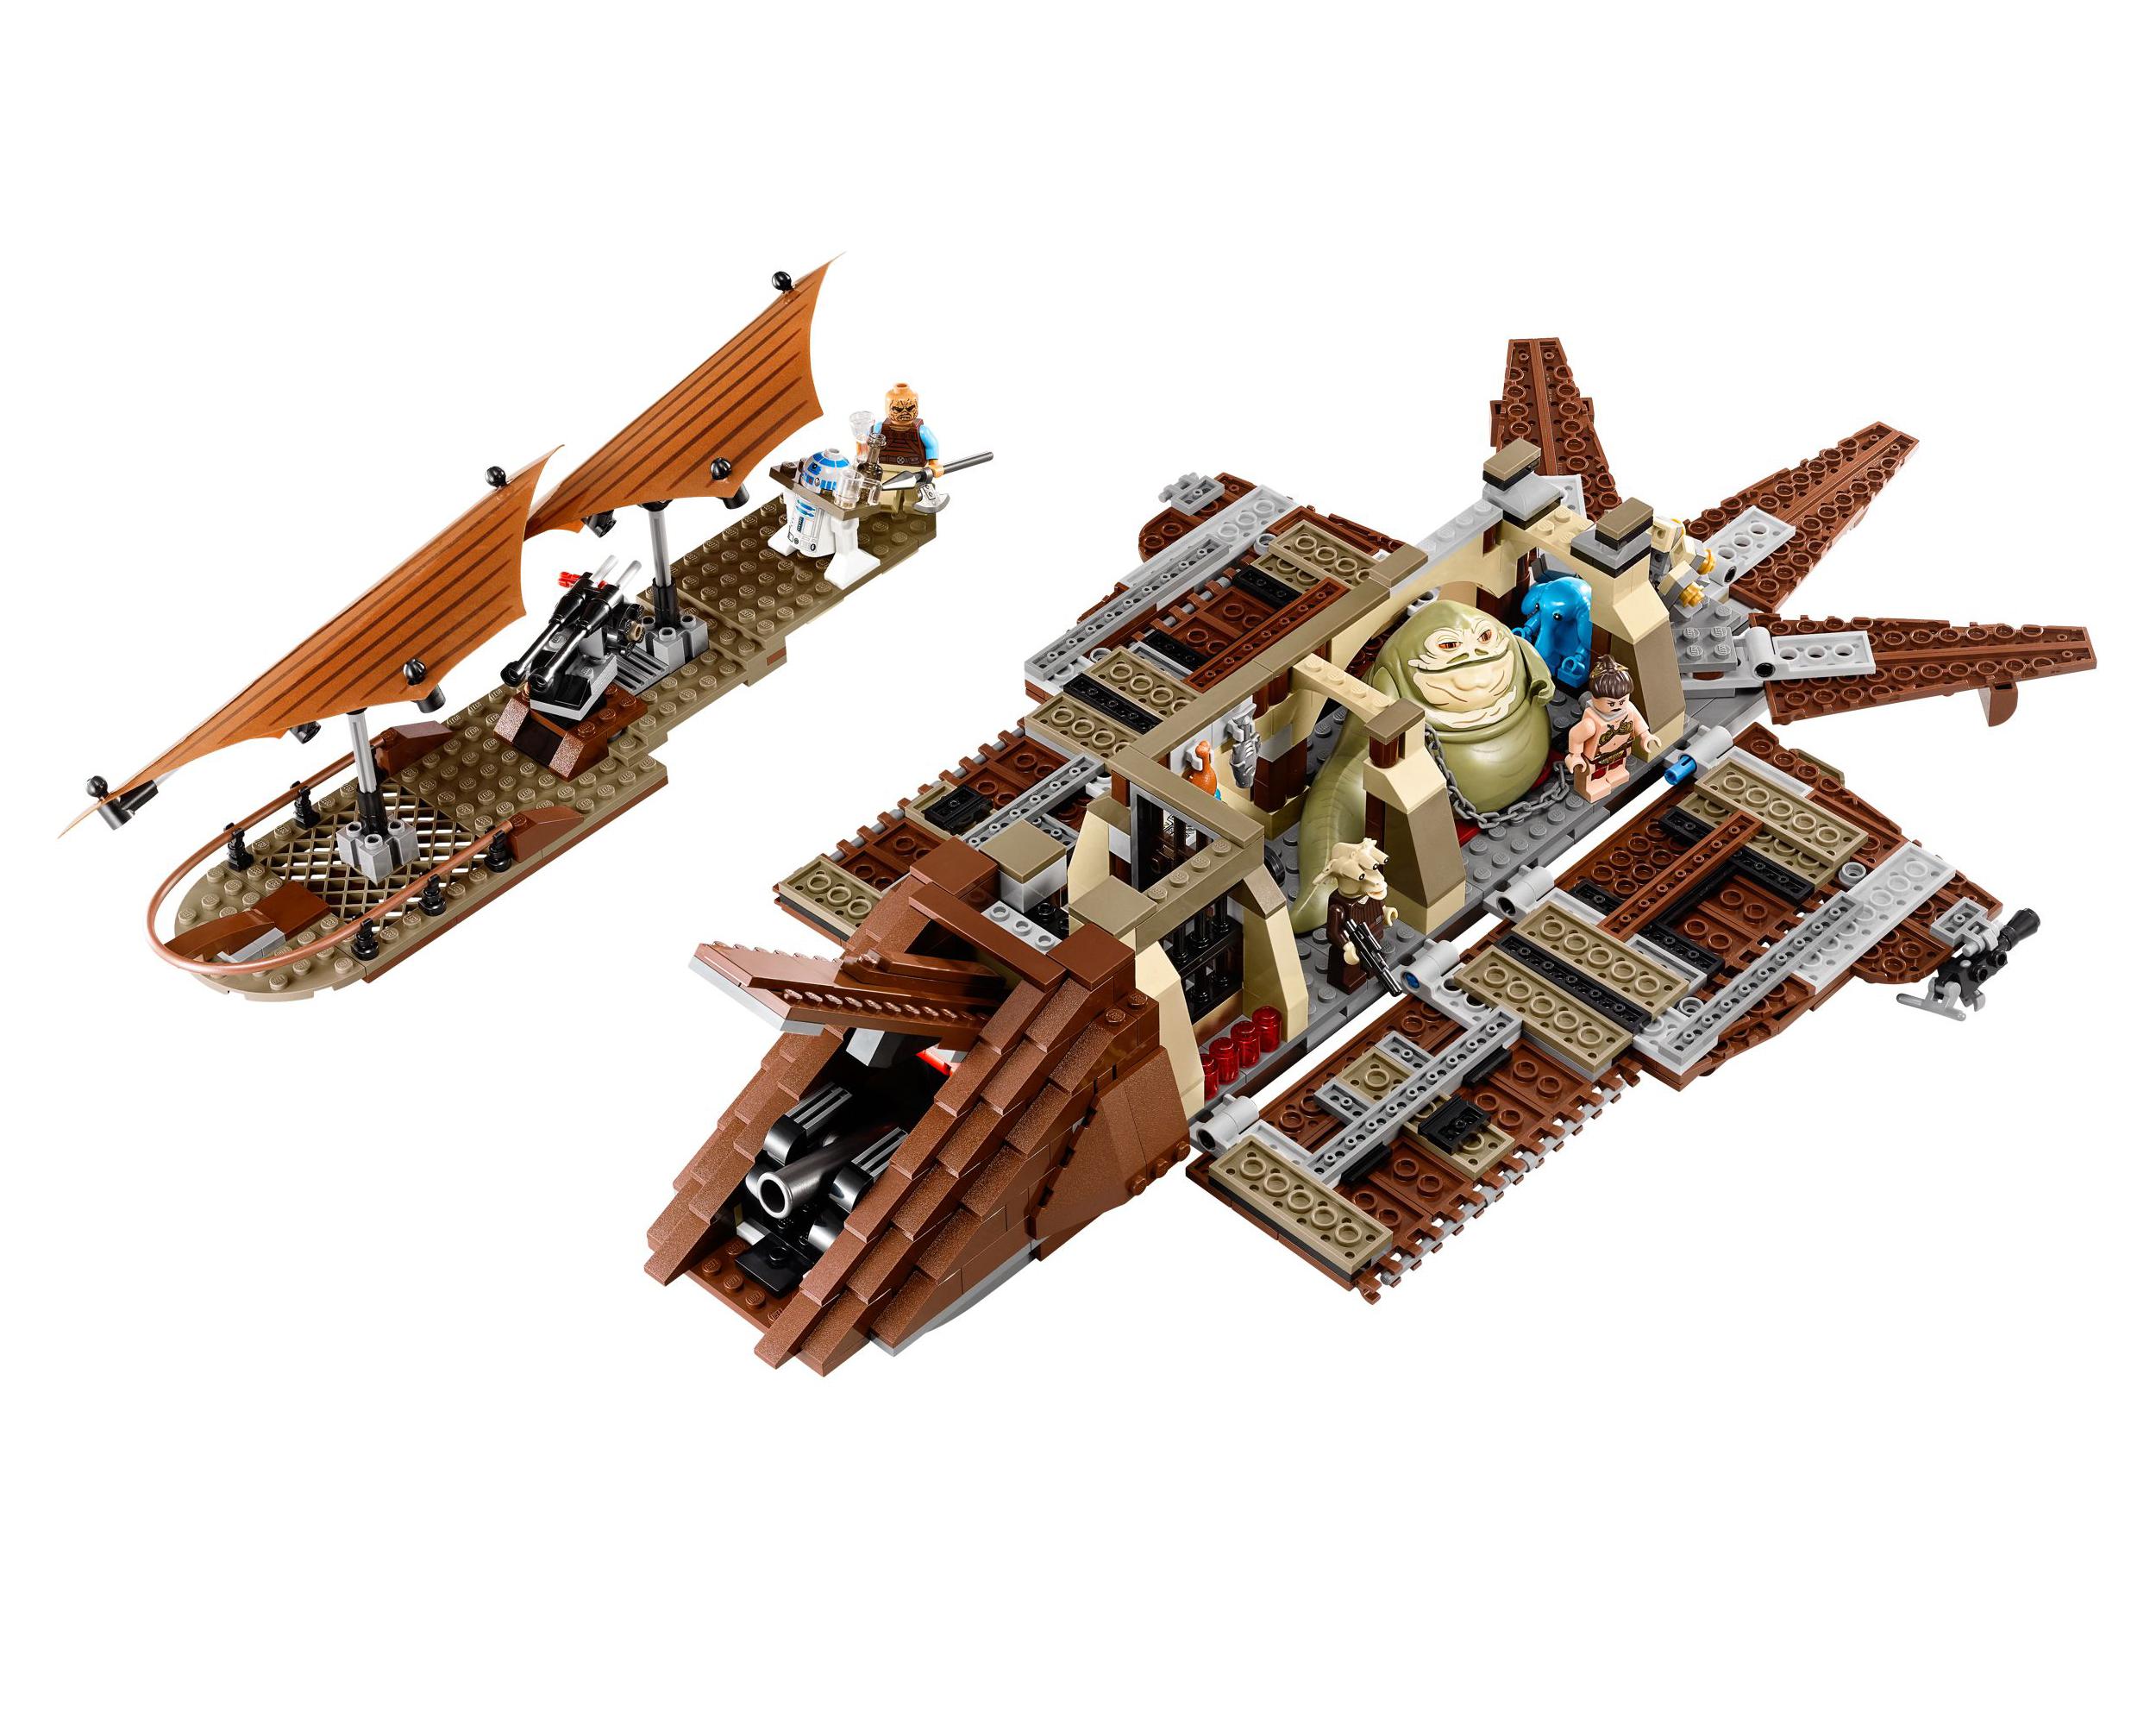 lego star wars 75020  jabba's sail barge  kaskus  the